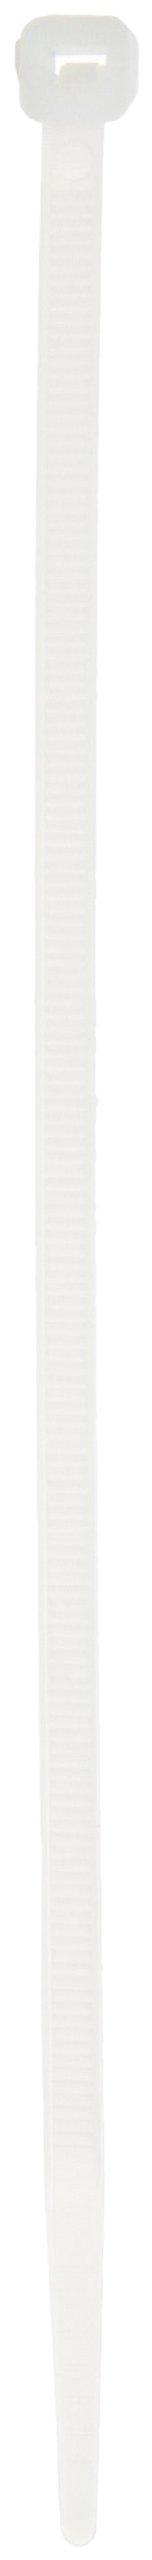 Brady 81762 7'' Length, Plastic Nylon Fasteners (Pack Of 100) by Brady